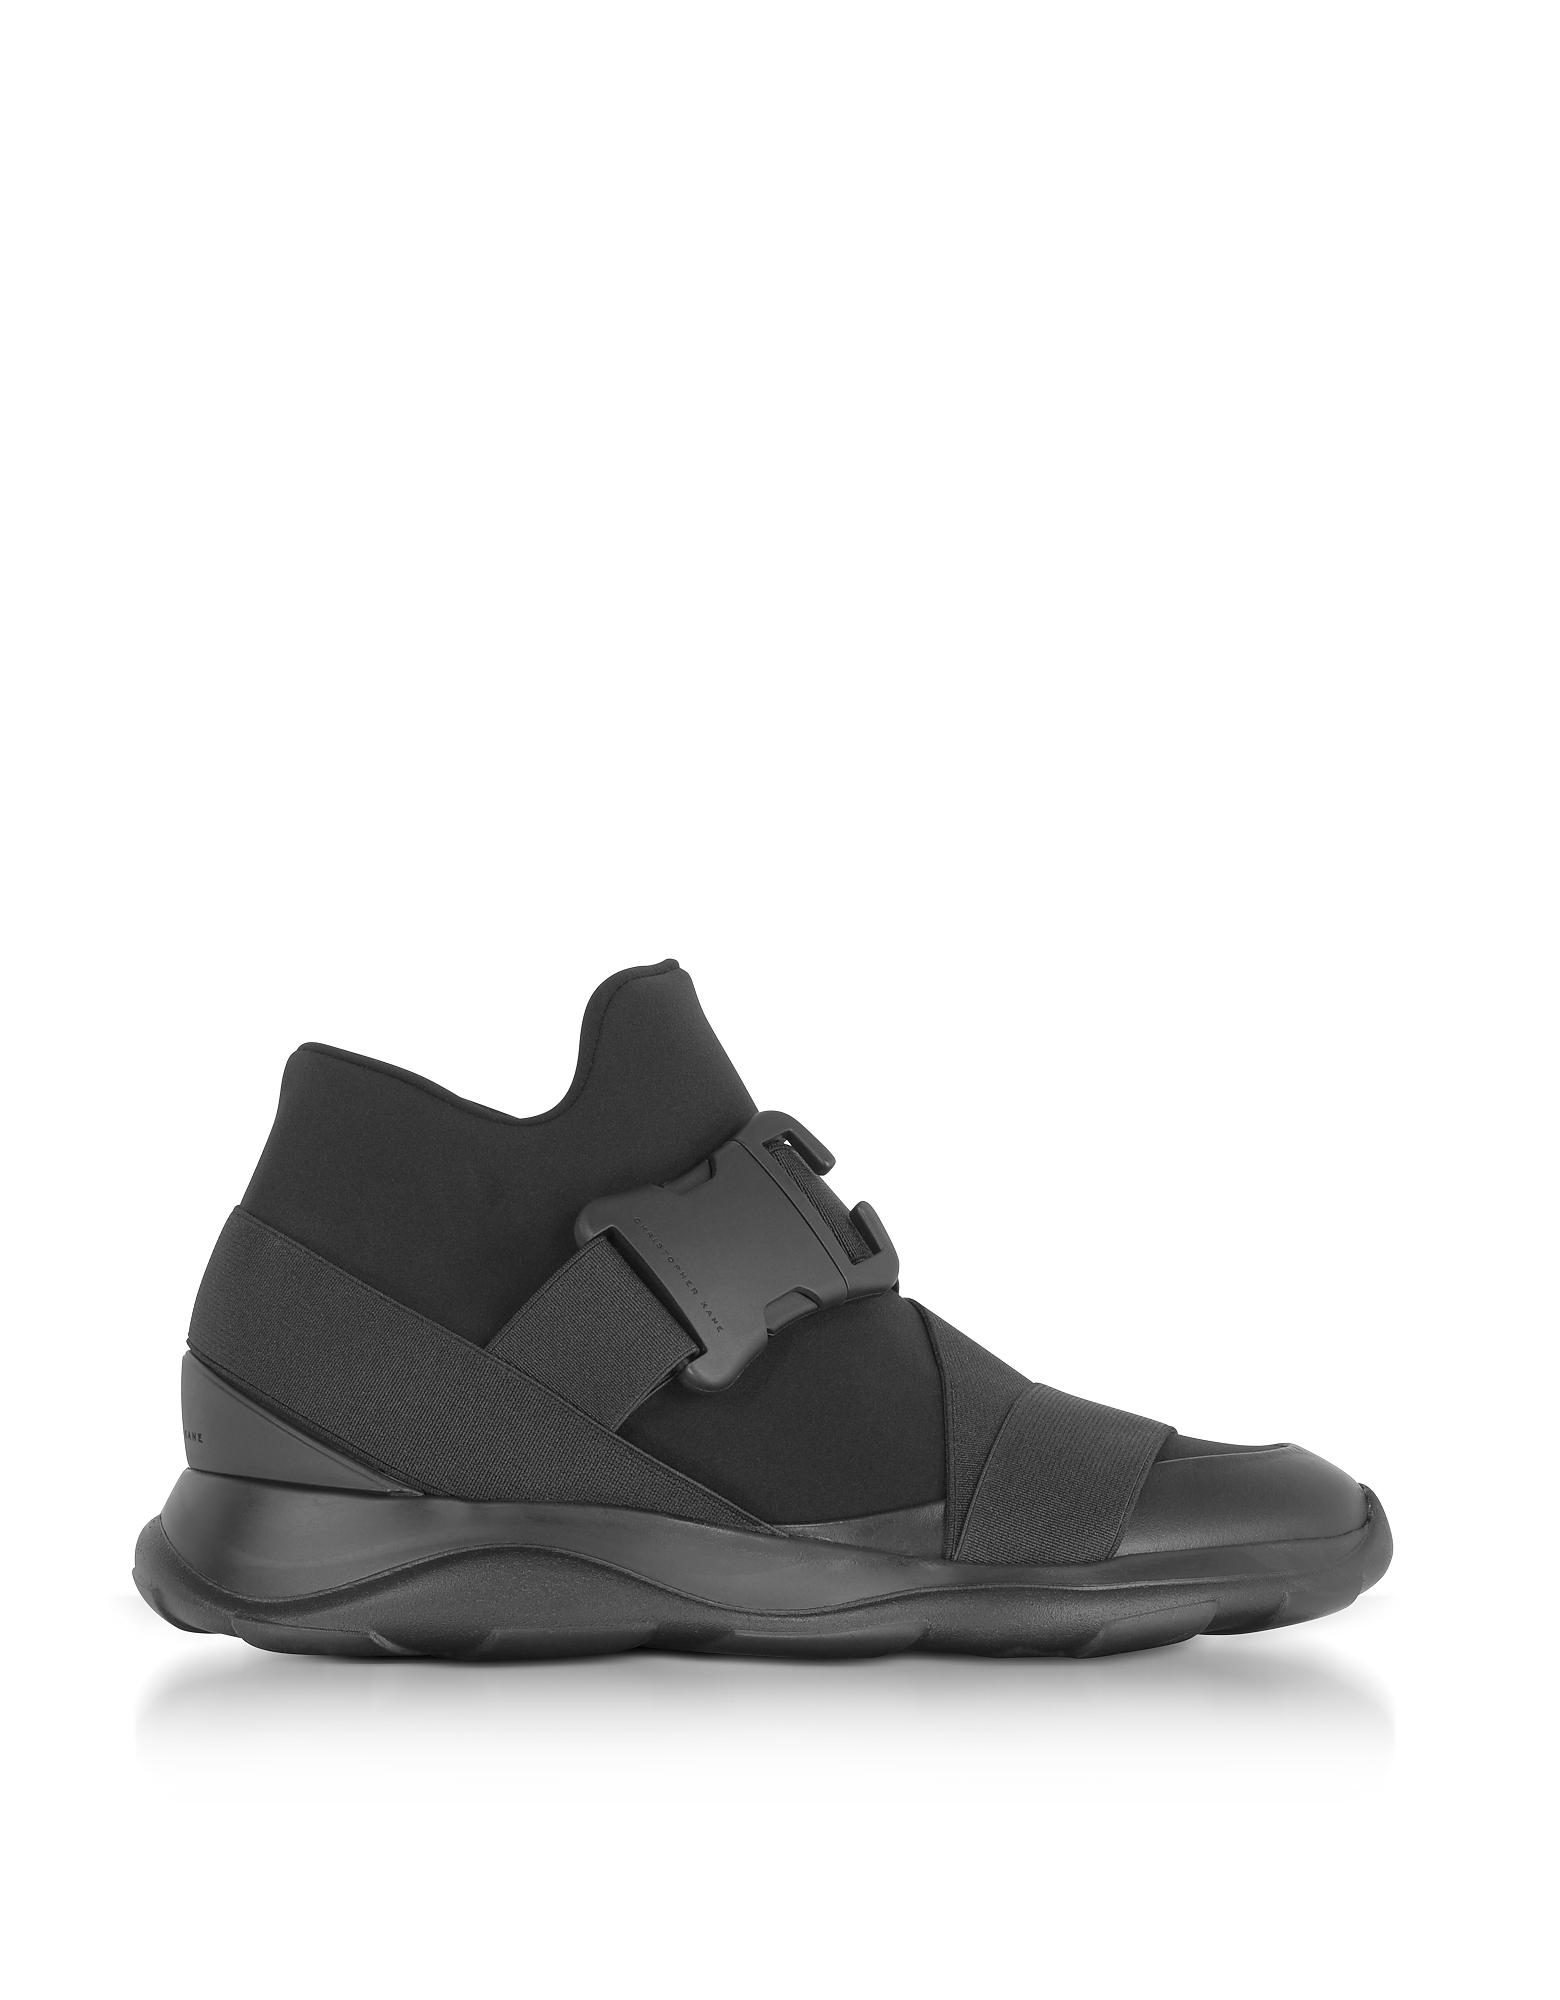 Christopher Kane Shoes, Black Neoprene High Top Women's Sneakers